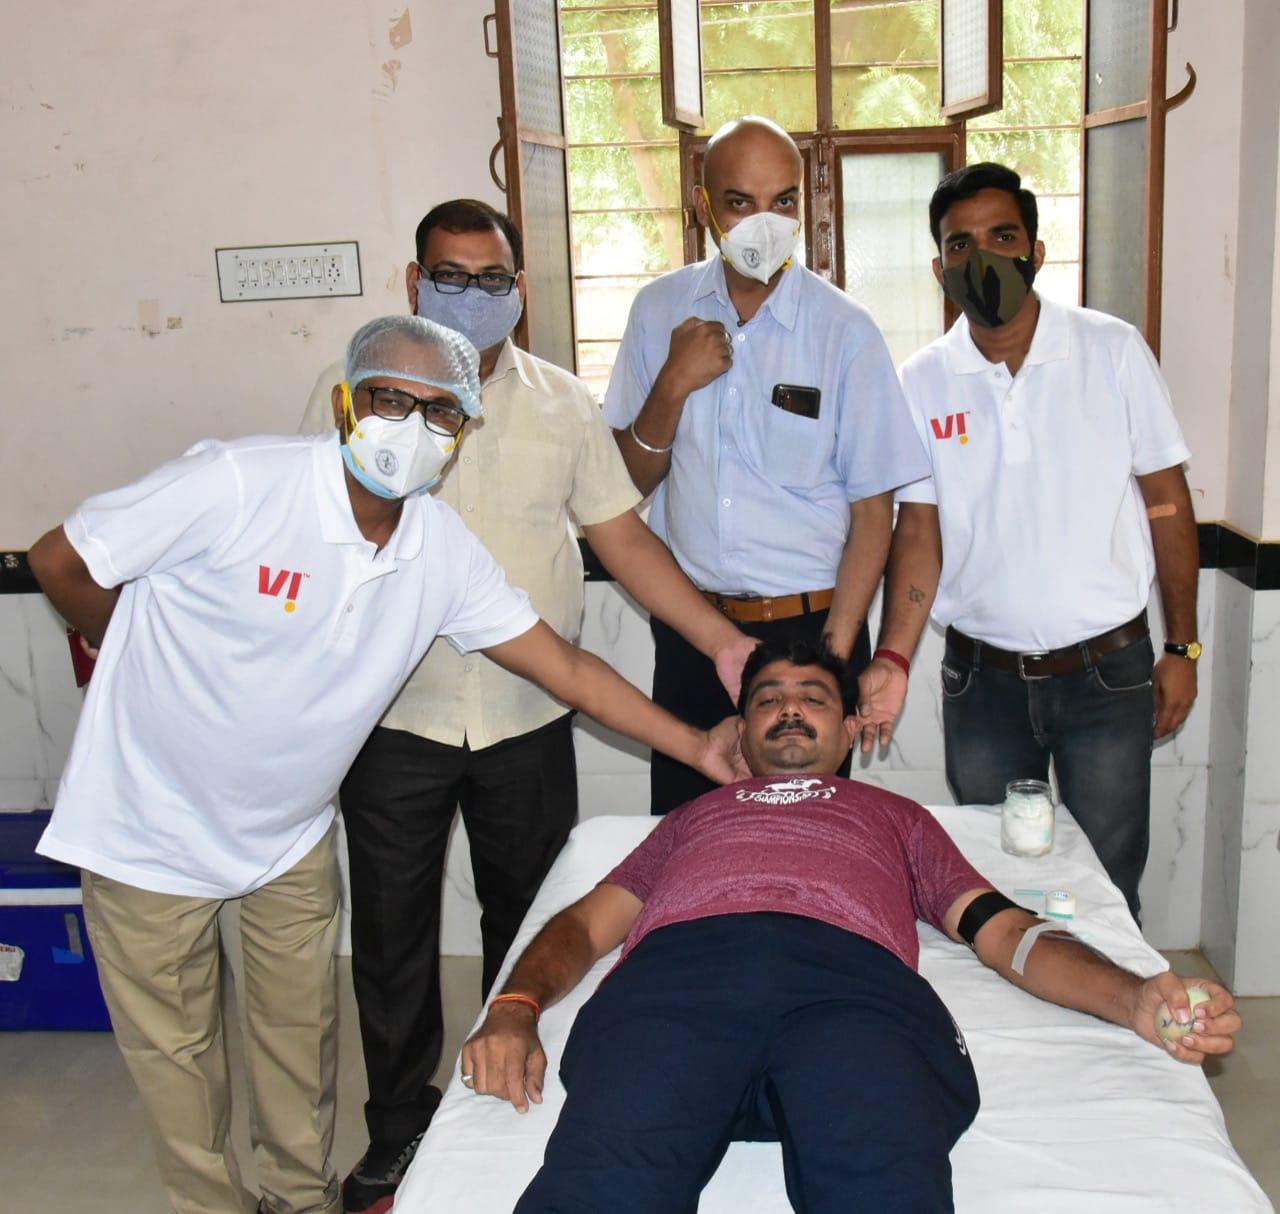 Blood, lifeline, Churu Hindi News, Hindi News Churu, Churu Latest News, CMHO Churu,